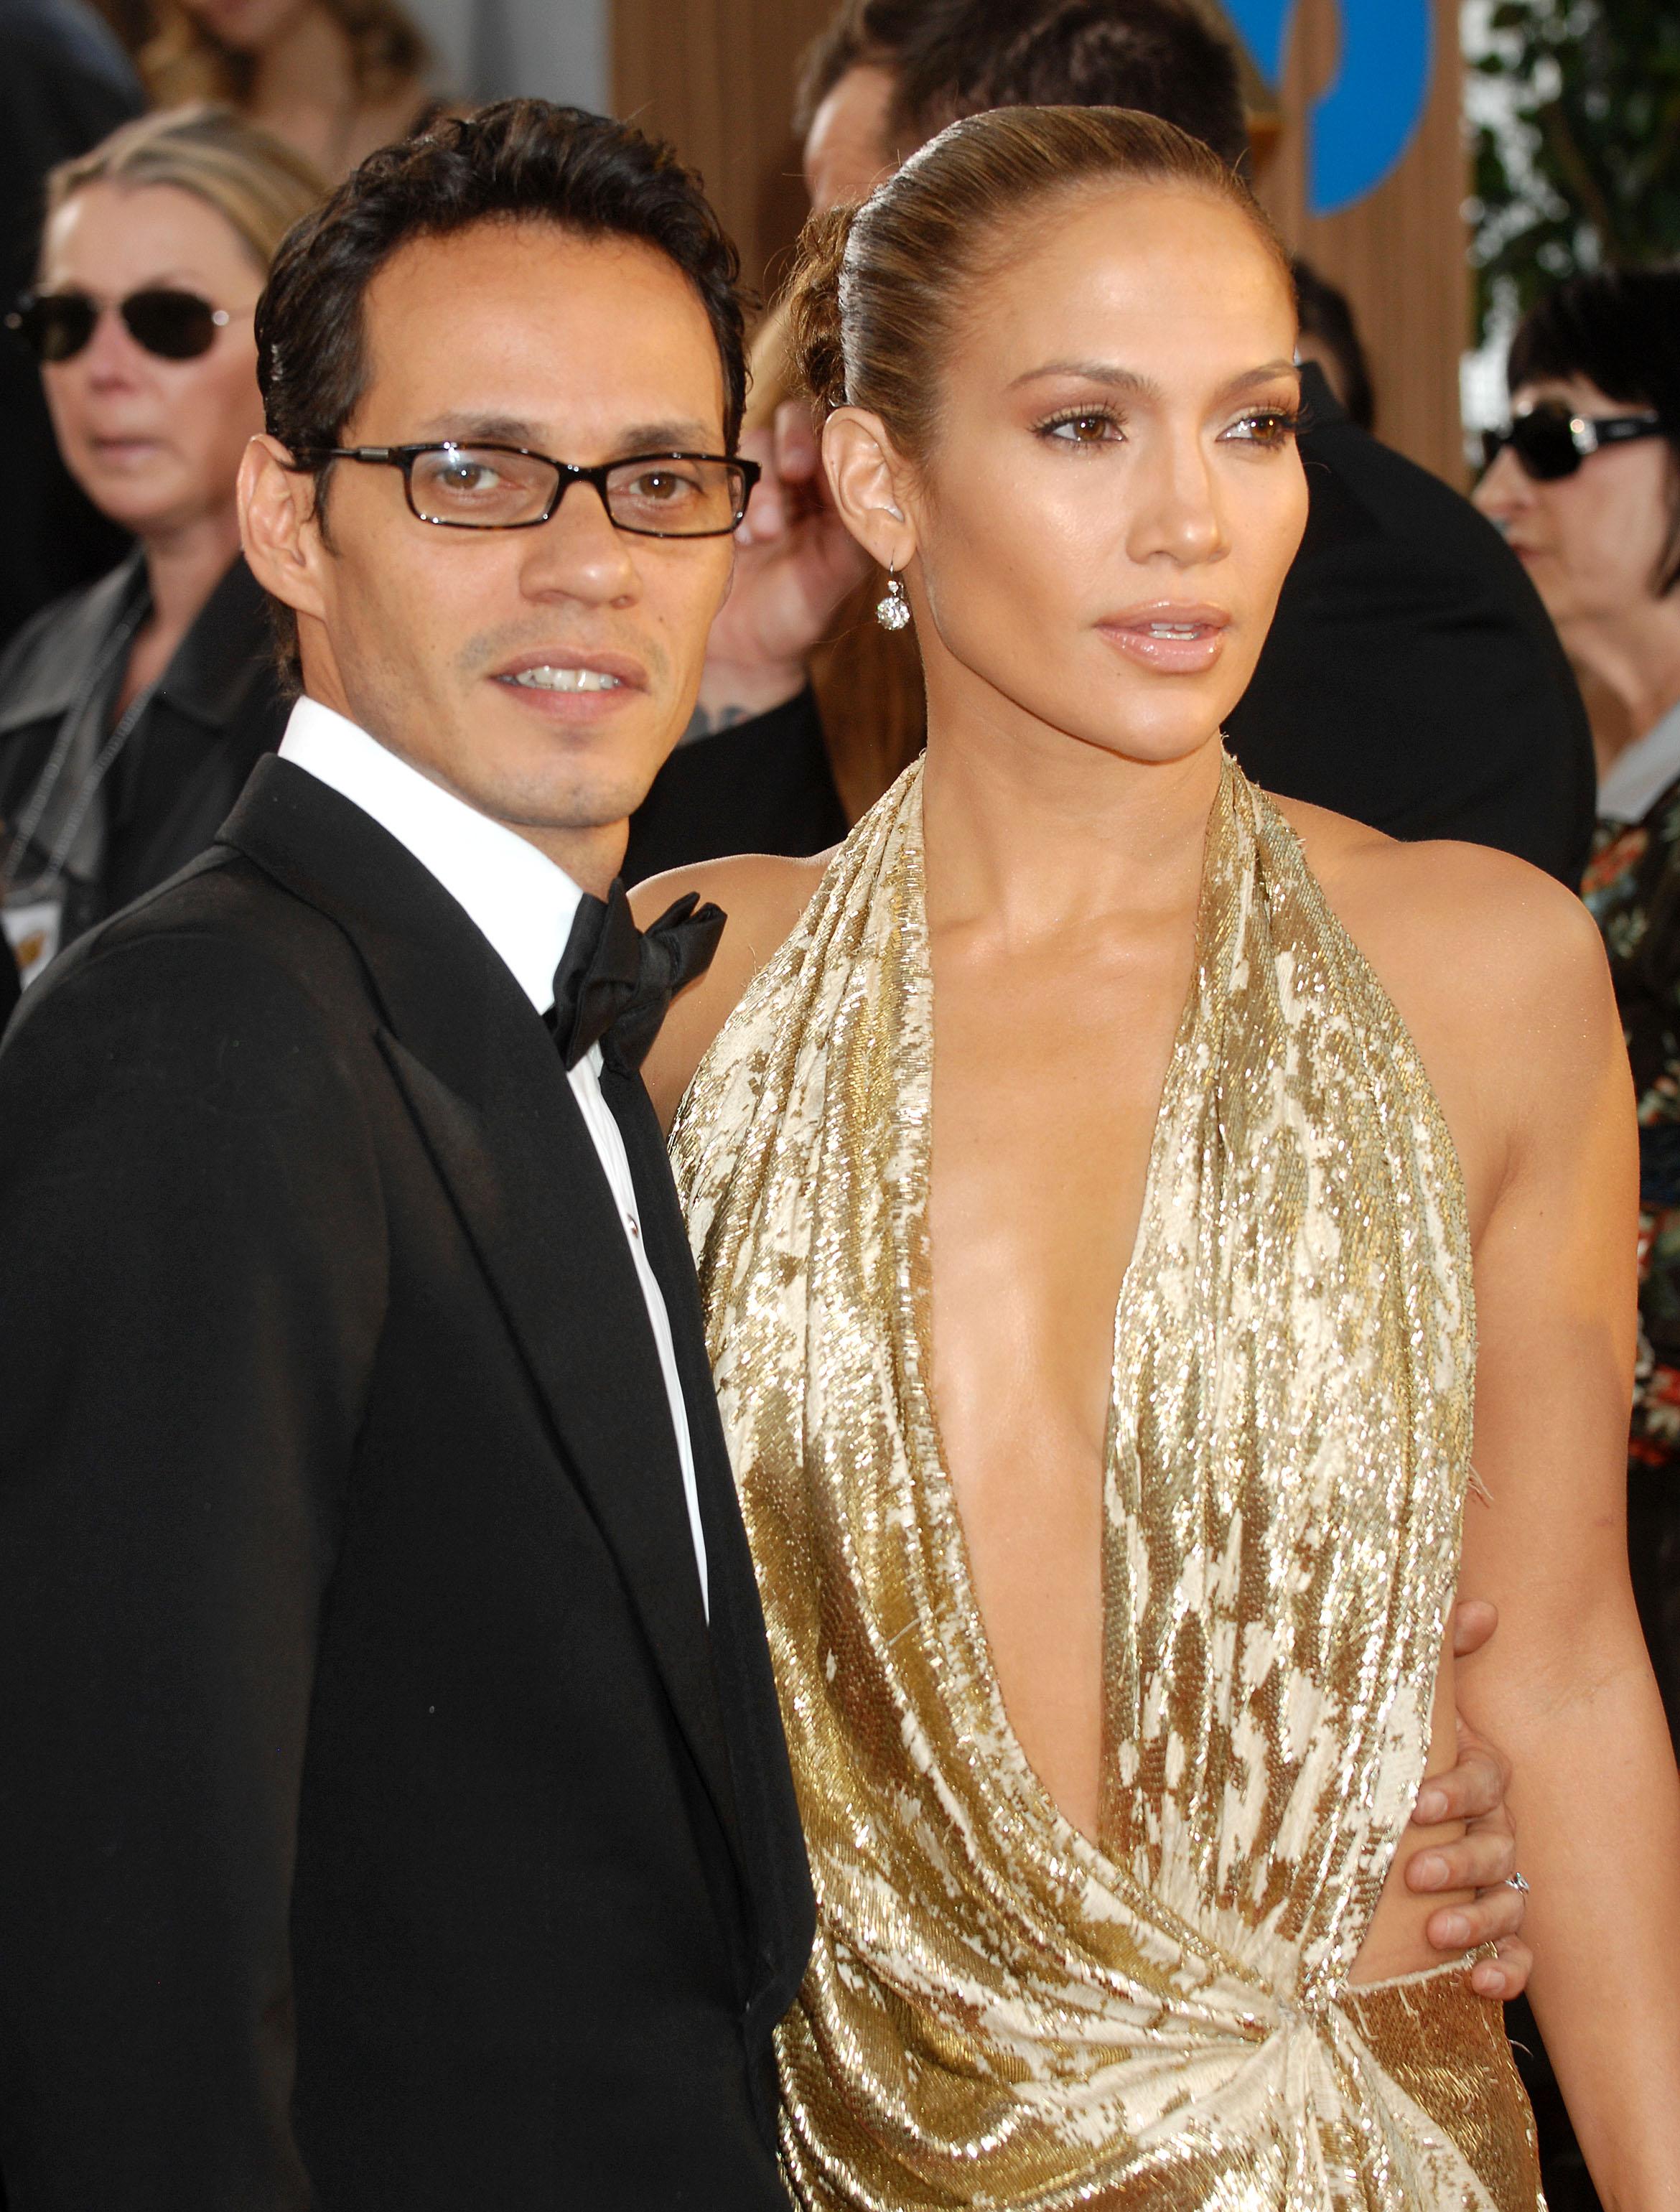 29184_Celebutopia-Jennifer_Lopez_arrives_at_the_66th_Annual_Golden_Globe_Awards-09_122_62lo.JPG